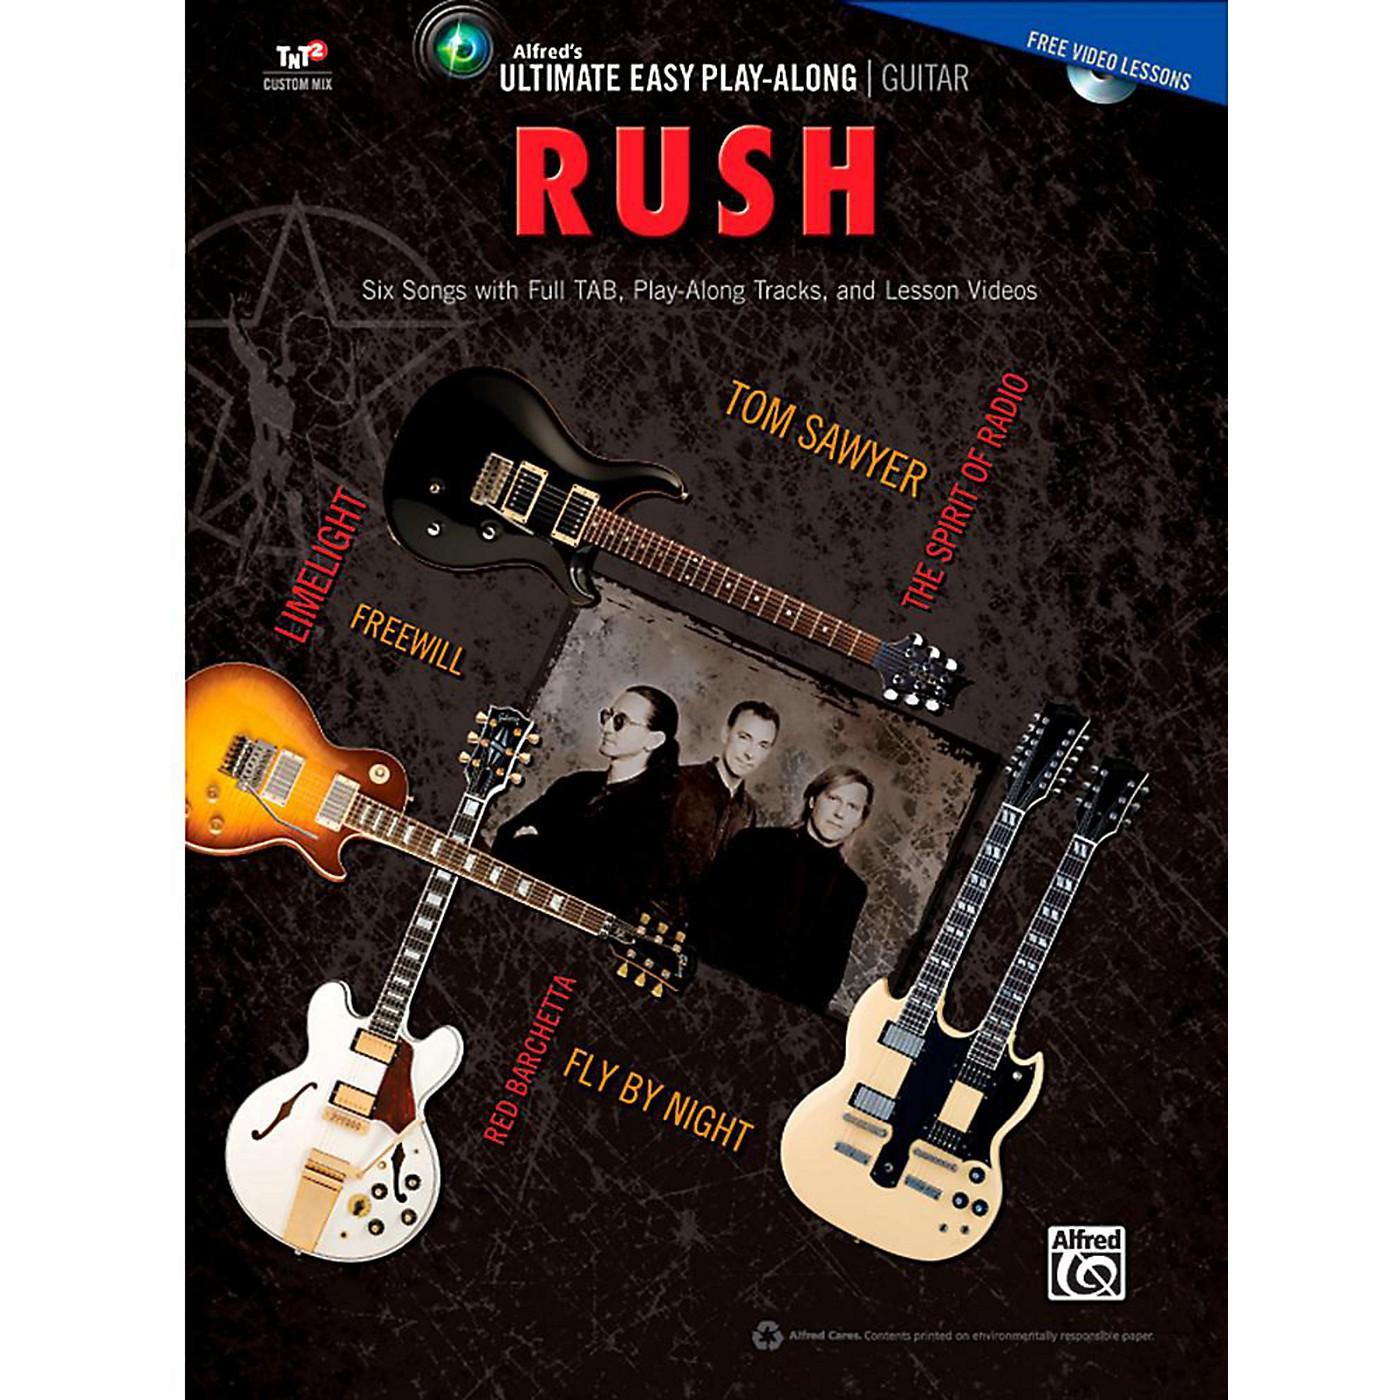 Alfred Ultimate Easy Guitar Play-Along: Rush - Easy Guitar TAB Songbook & DVD thumbnail